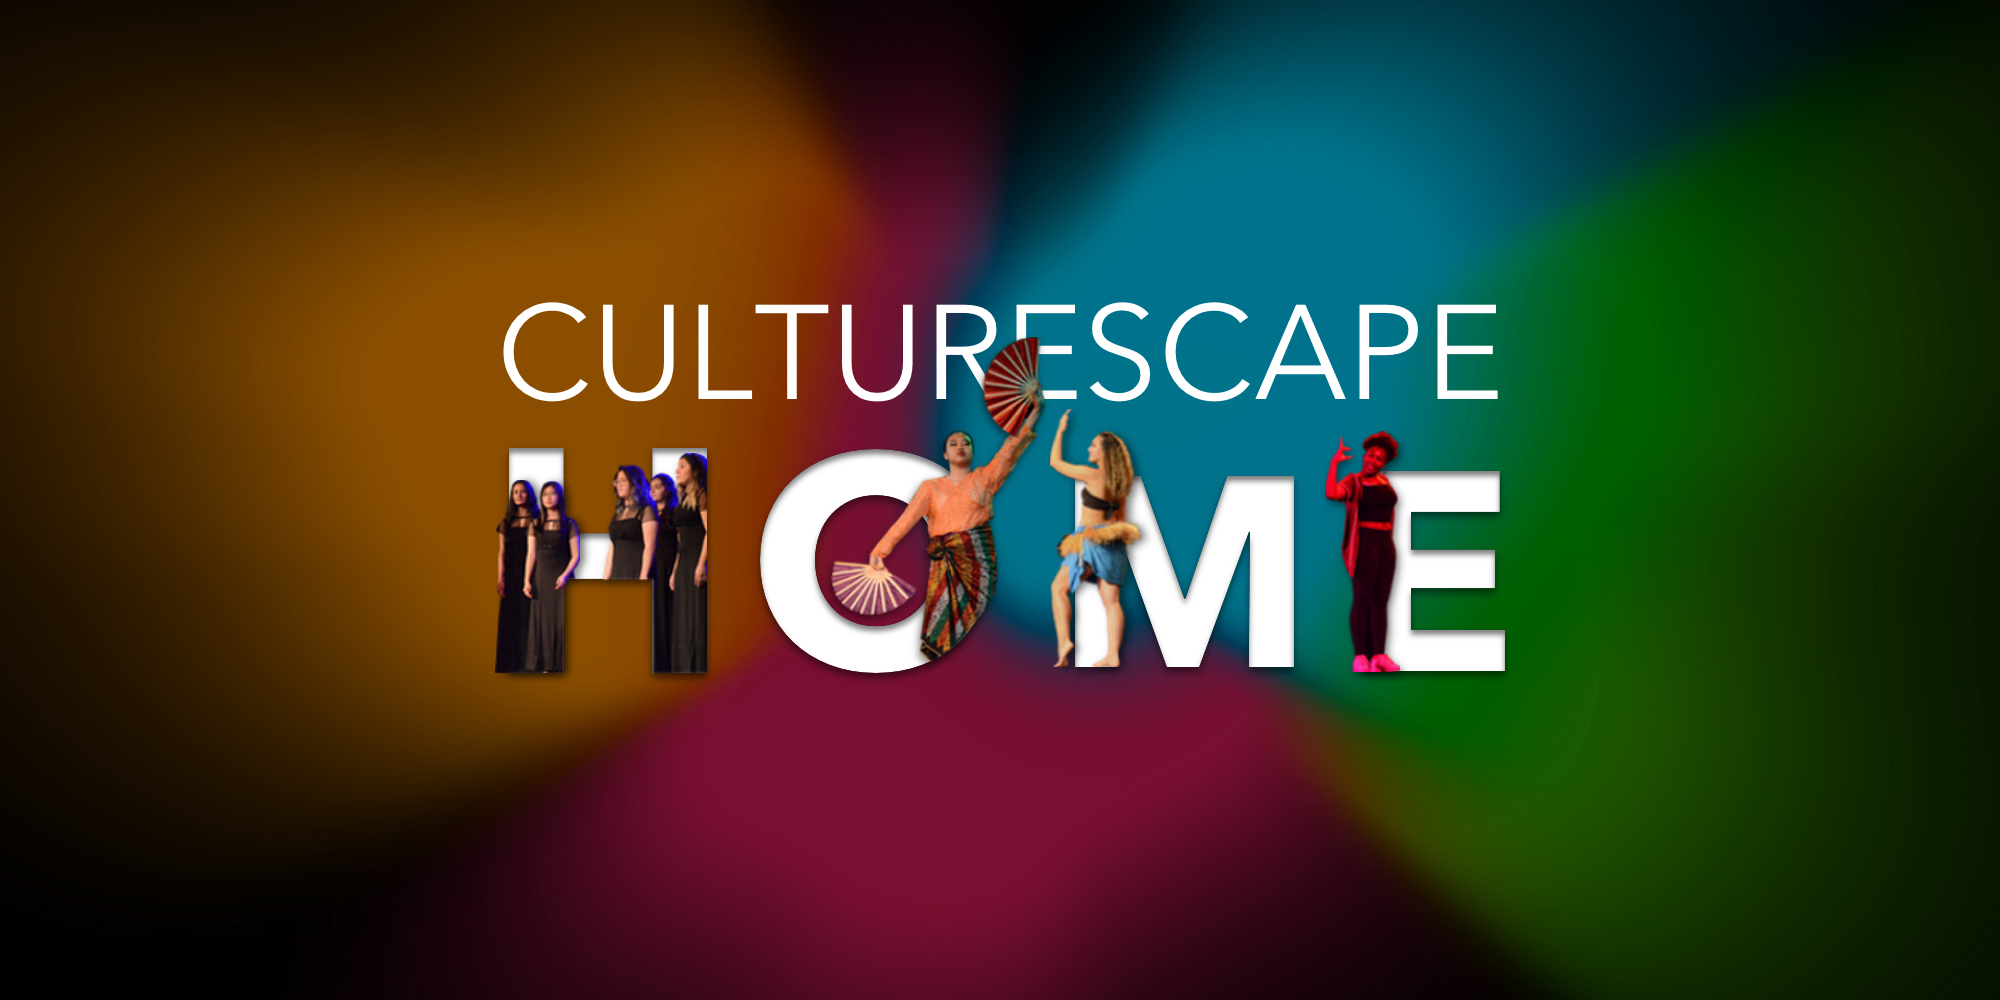 Culturescape HOME